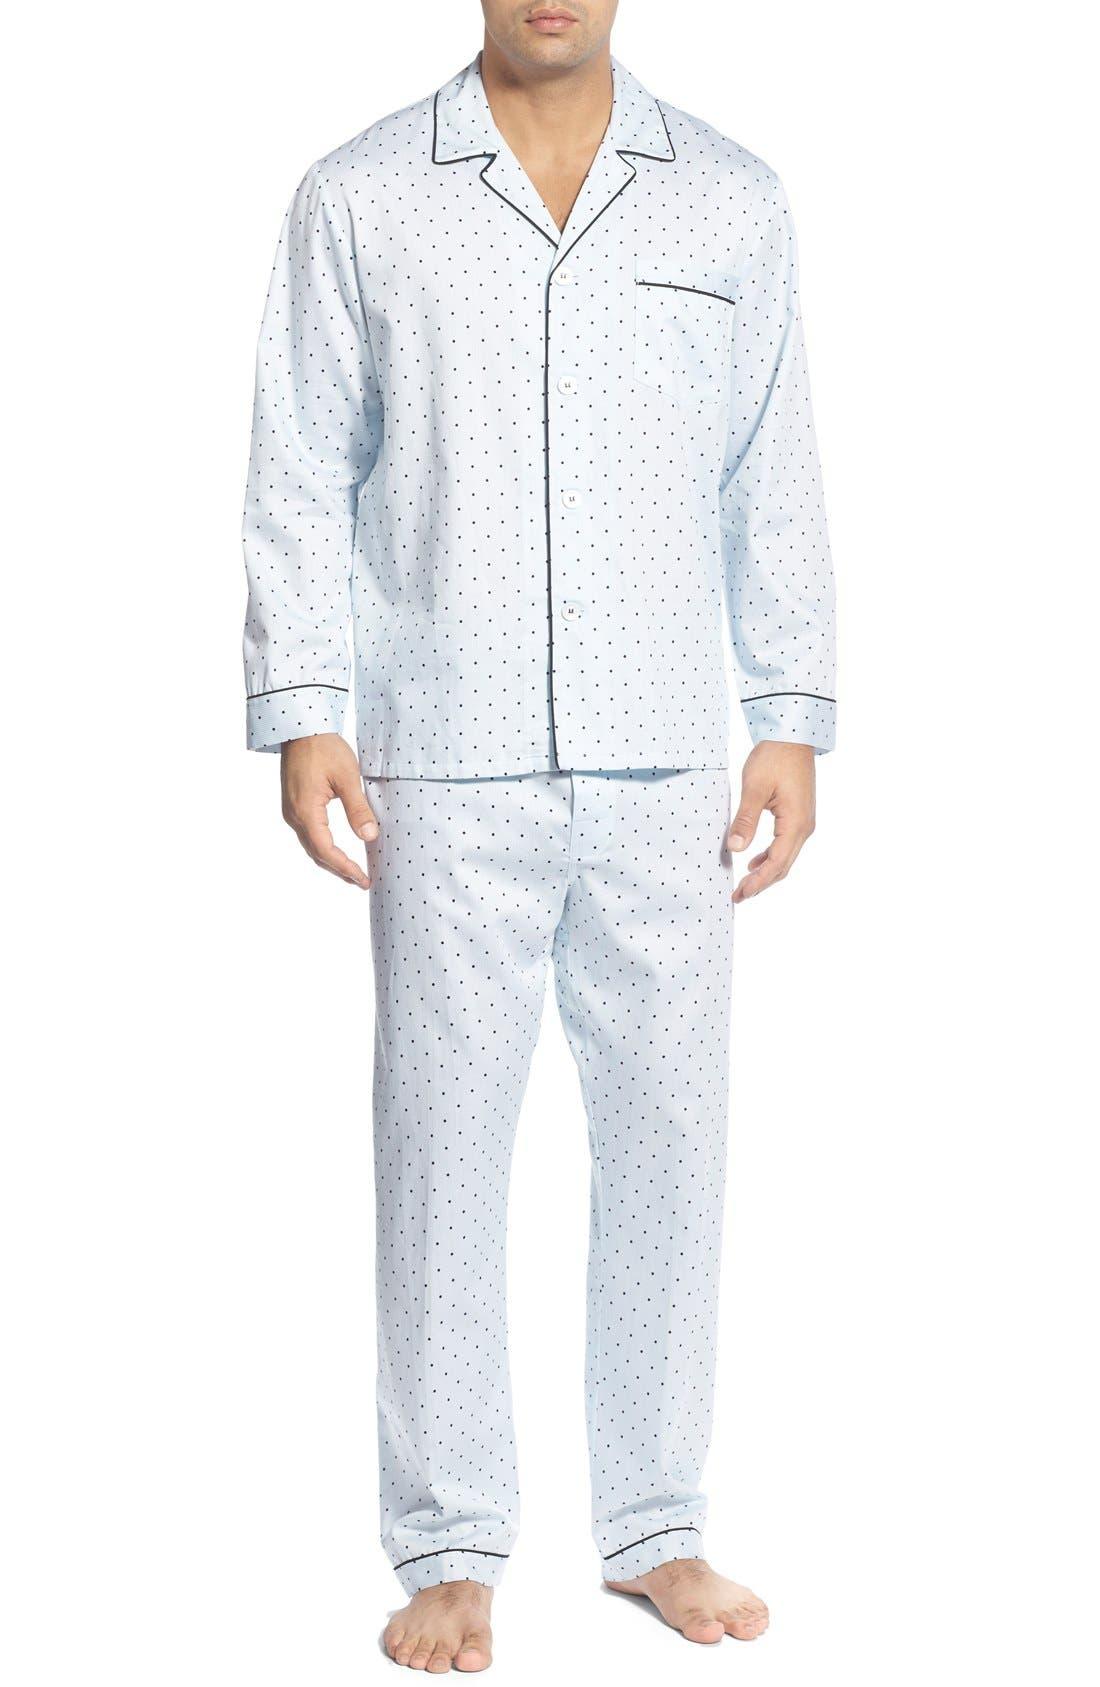 'Twilight' Cotton Pajamas,                             Main thumbnail 1, color,                             400